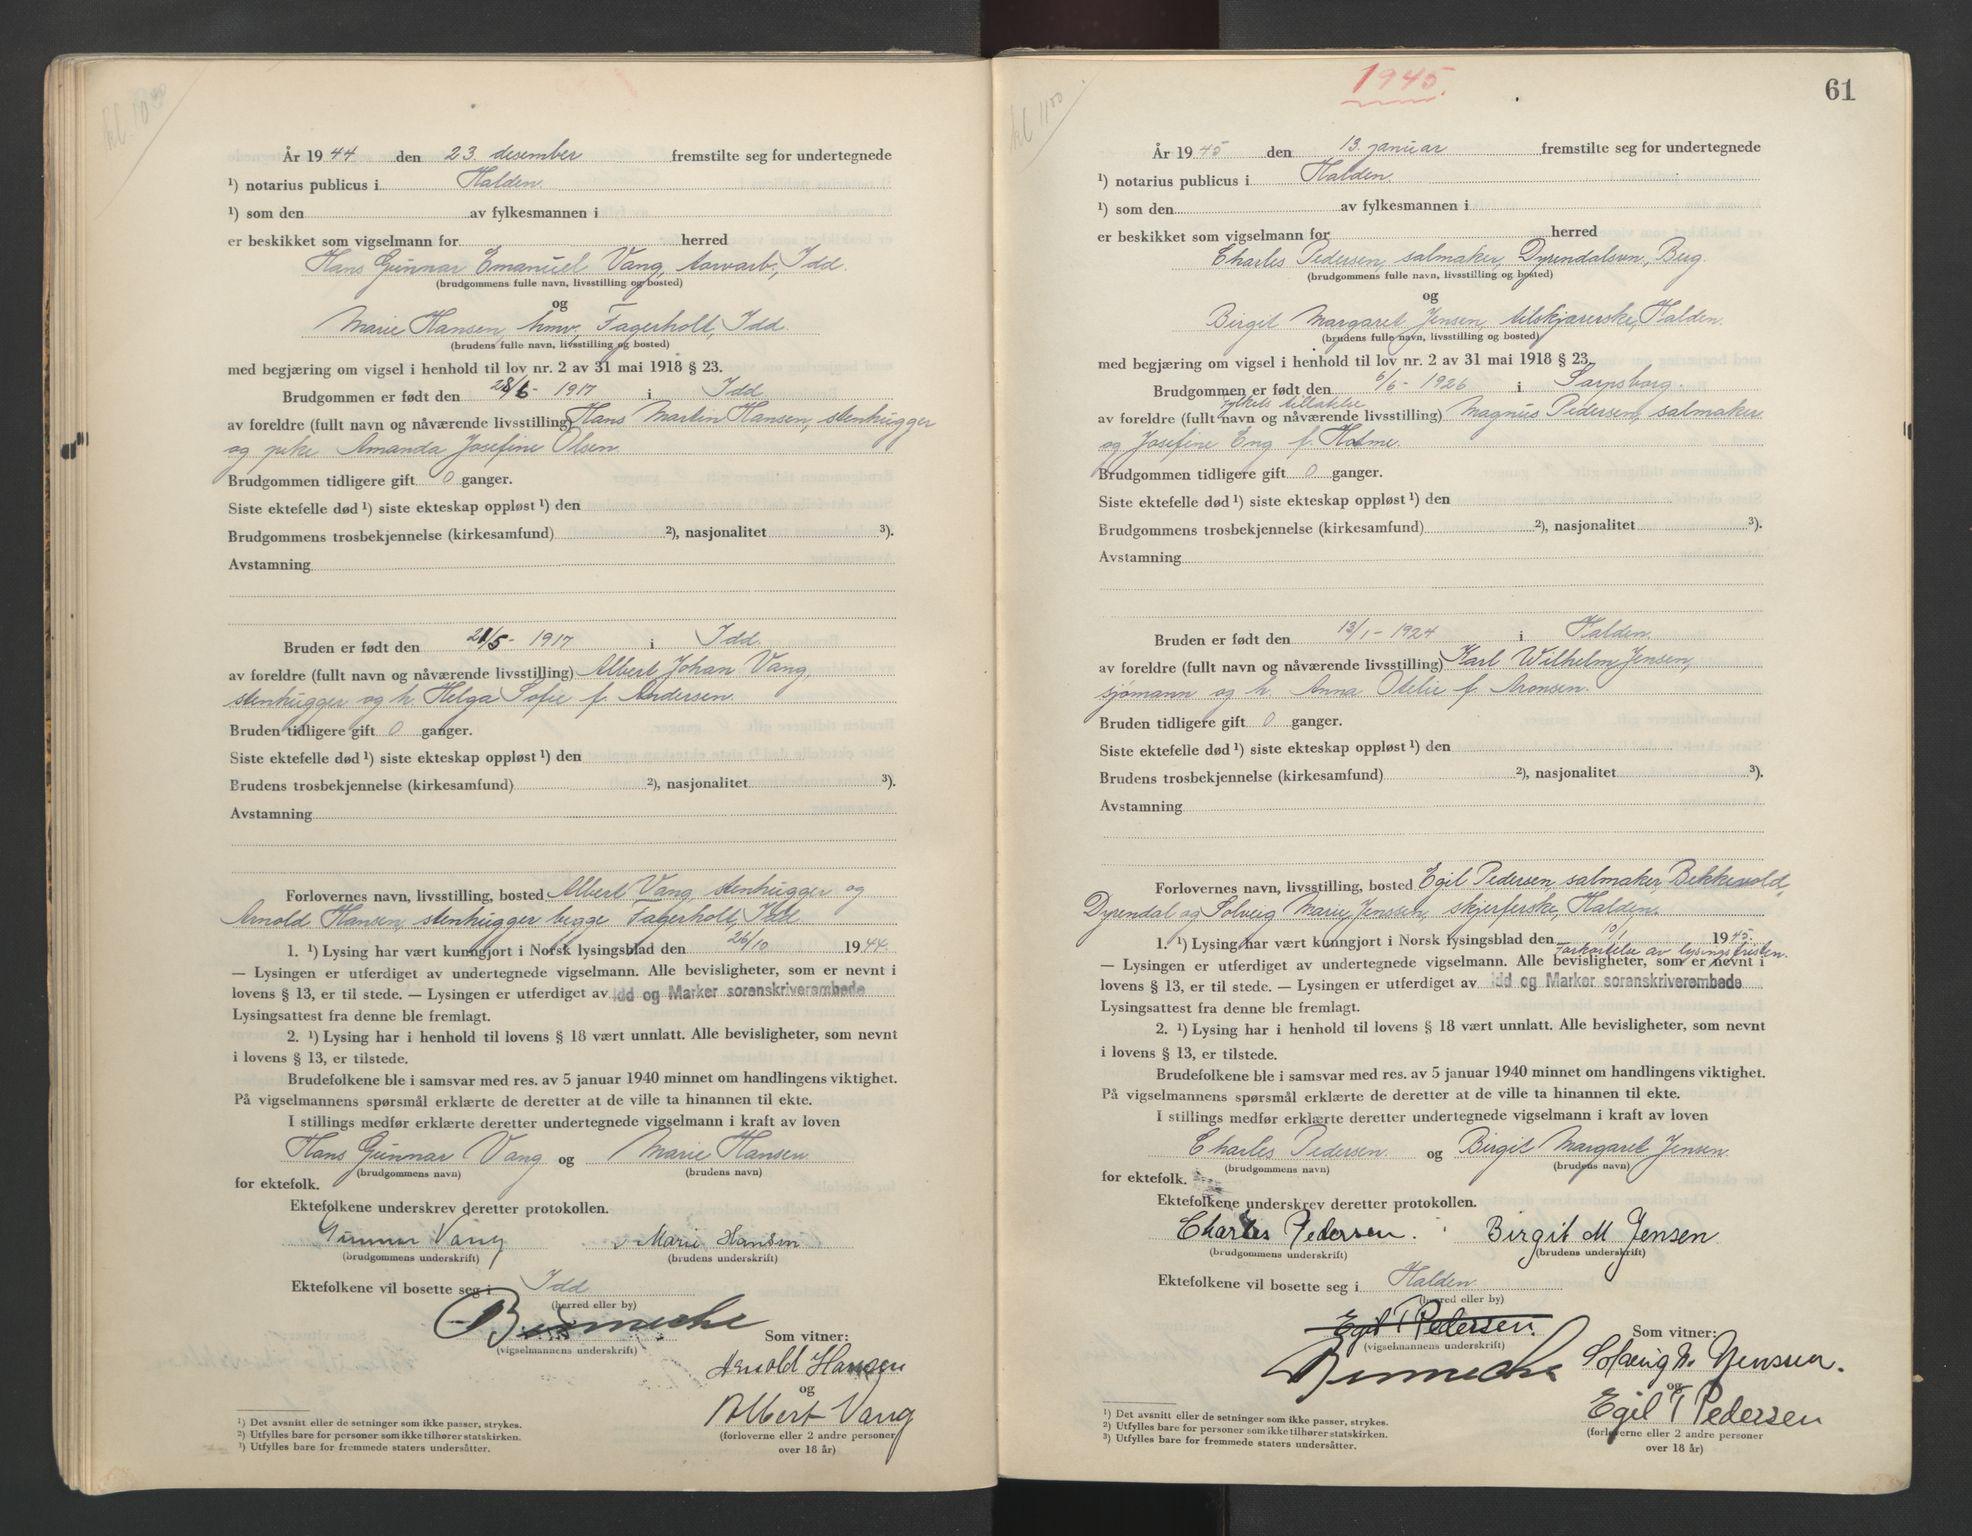 SAO, Idd og Marker sorenskriveri, L/Lc/L0001: Vigselsbøker, 1944-1945, s. 61